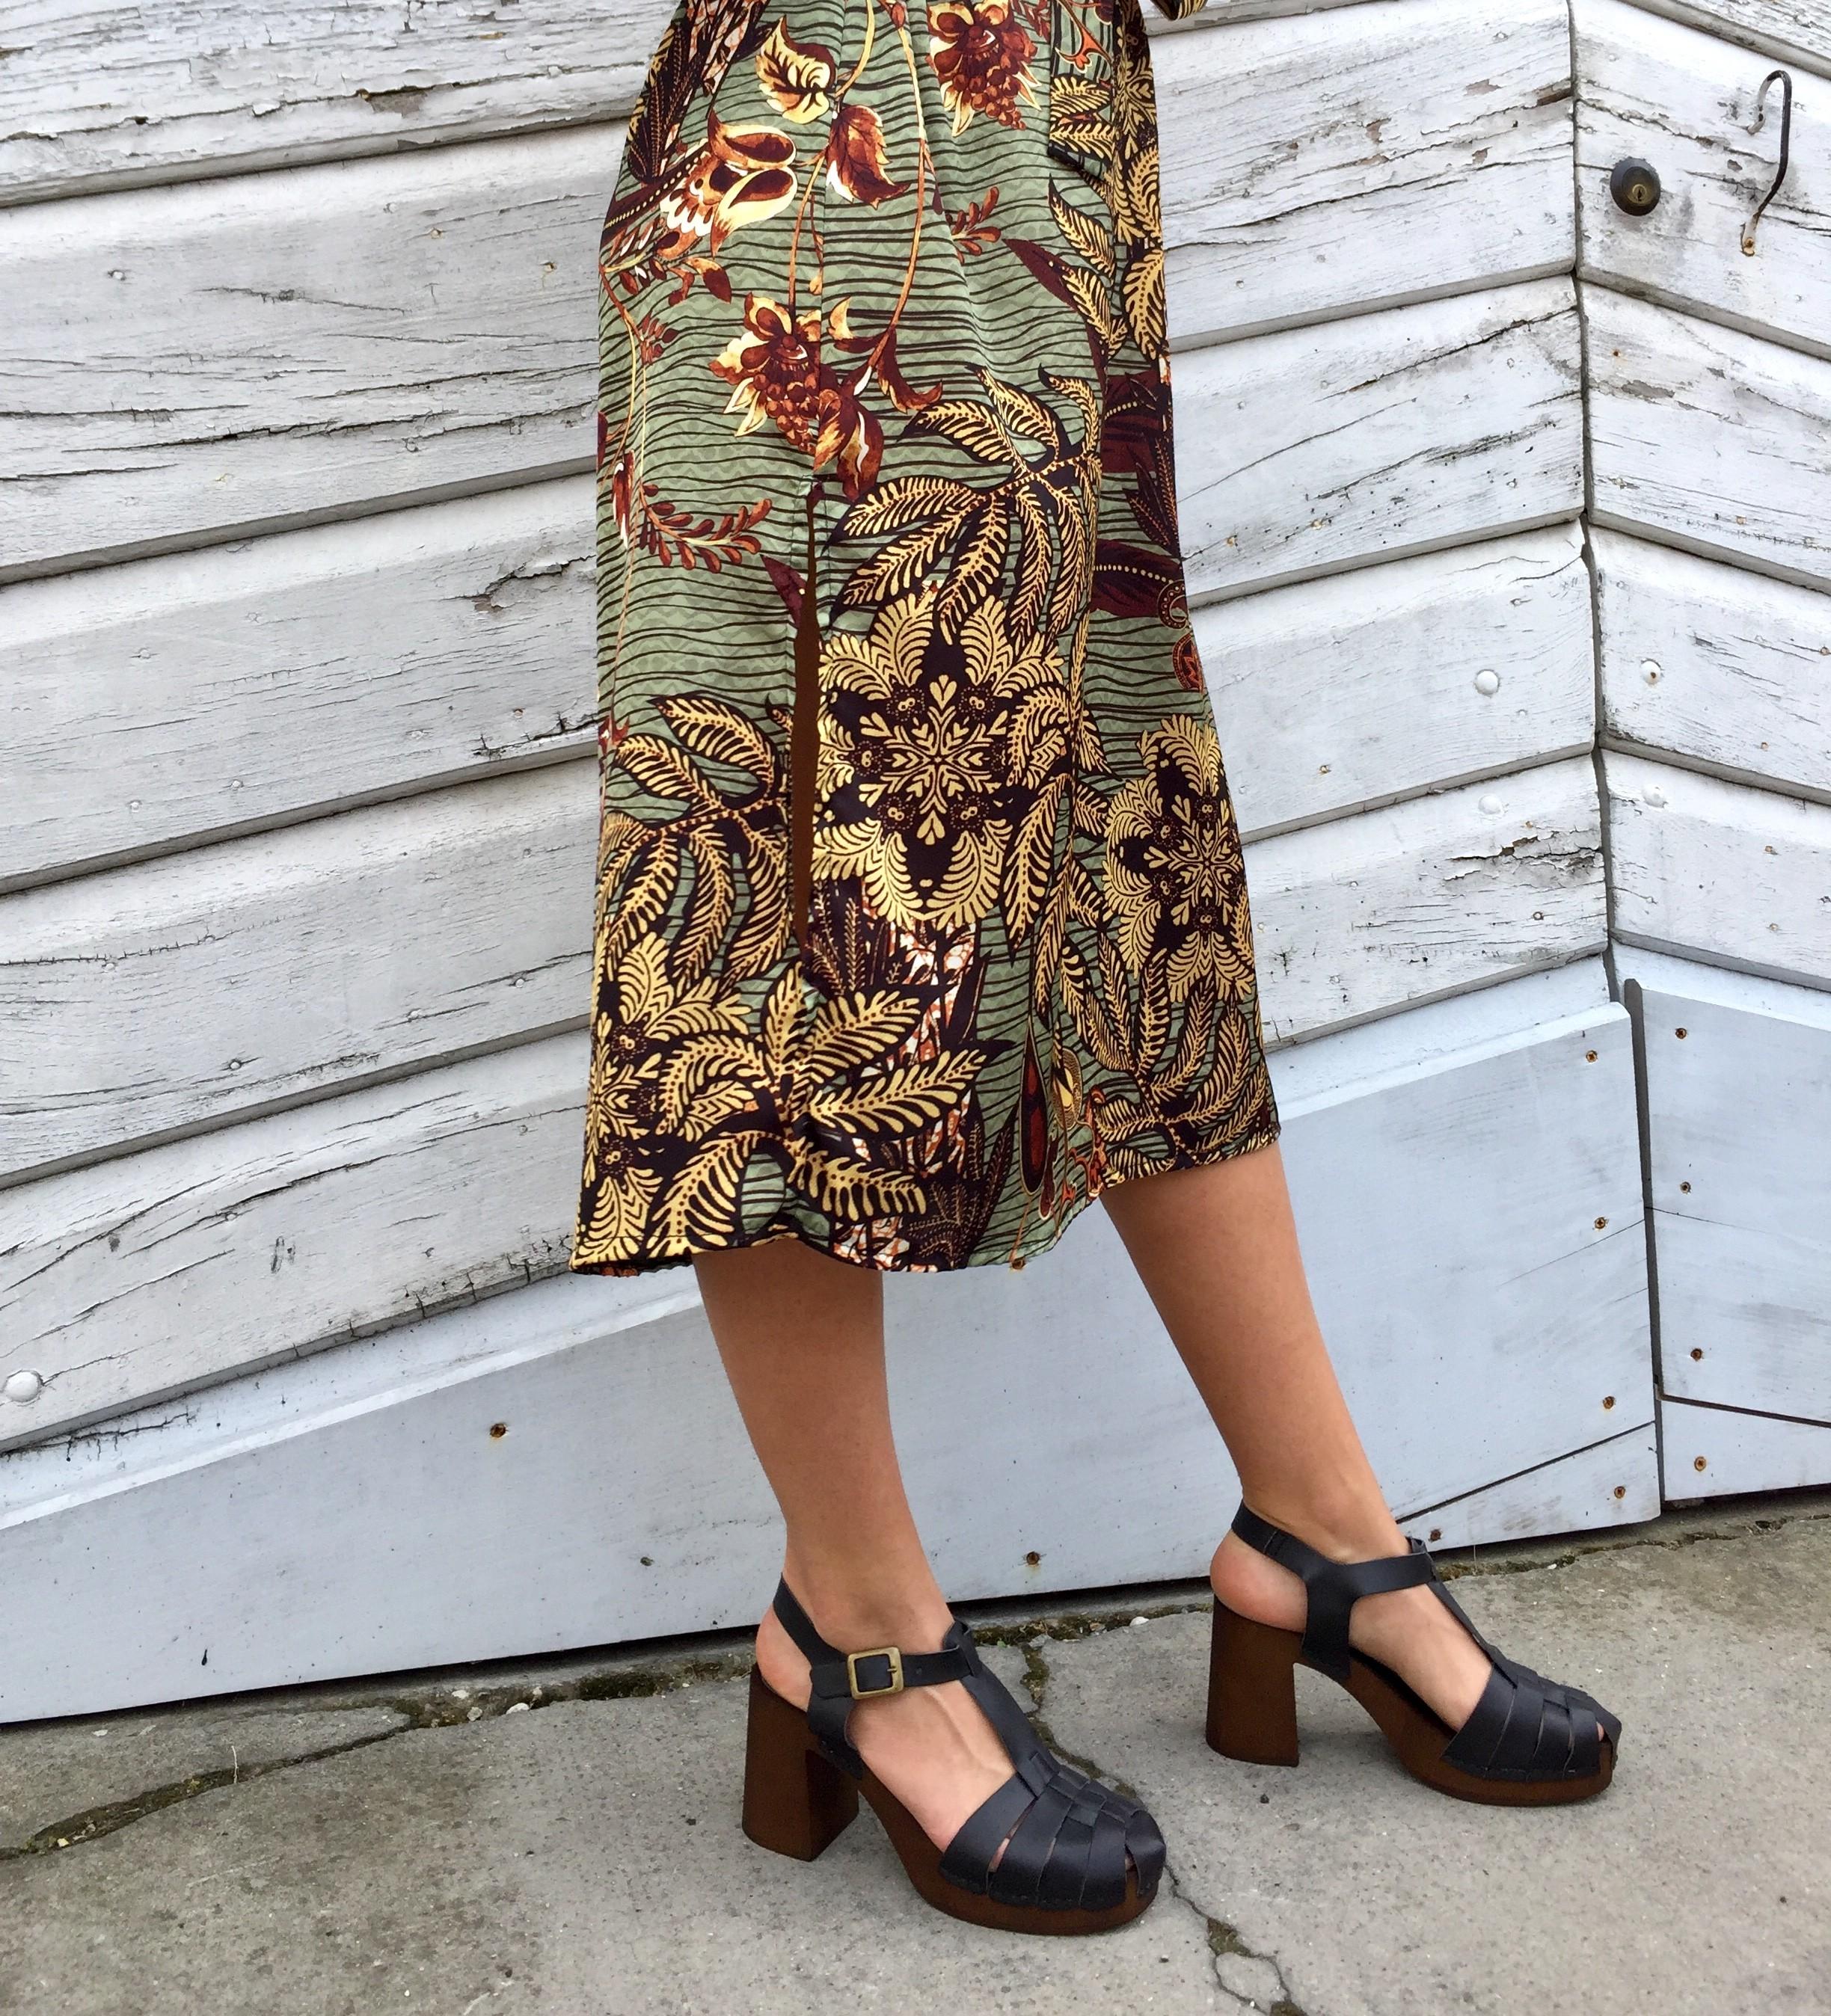 zoccoli donna vegan punta chiusa neri